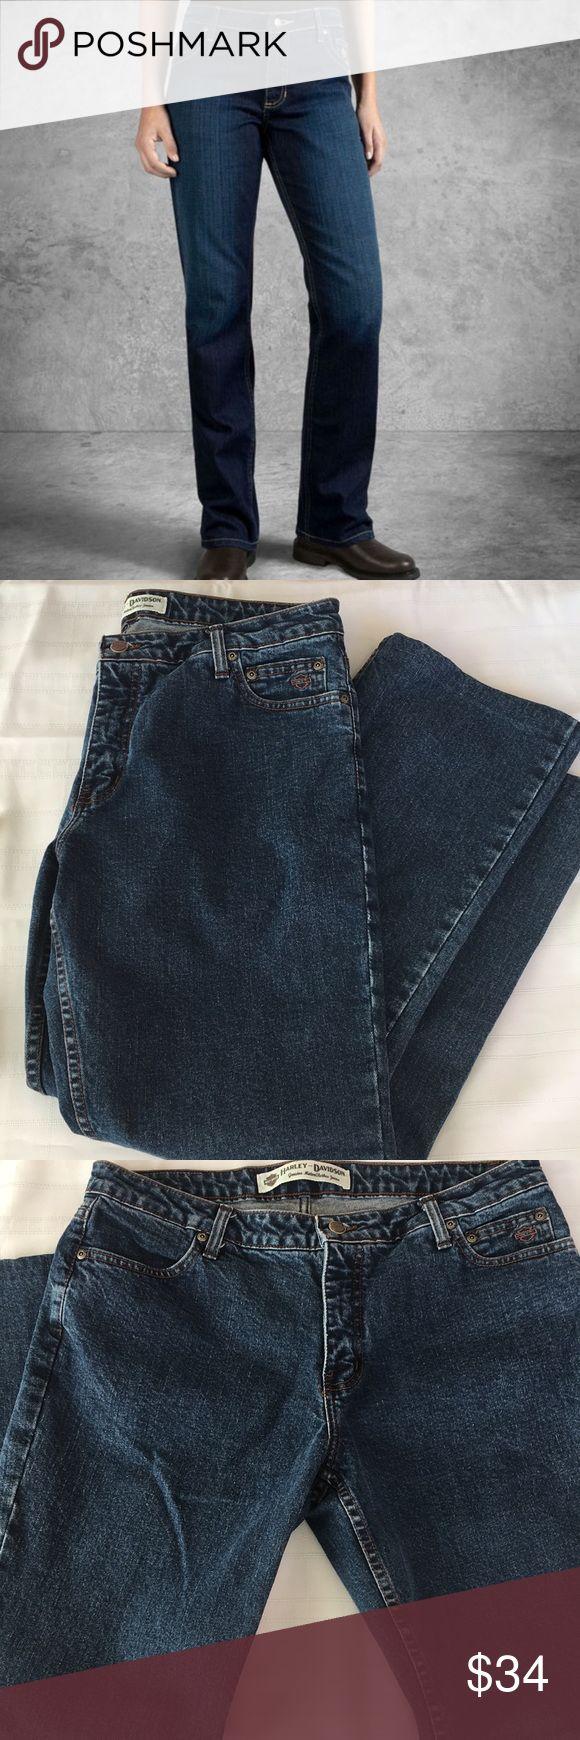 "Harley-Davidson Denim Bootcut Jeans Harley Davidson Bootcut Jeans- Size 14- EUC 97% Cotton / 3% Lycra Waist 36"" Length 38.5"" Harley-Davidson Jeans Boot Cut #harleydavidsonboots"